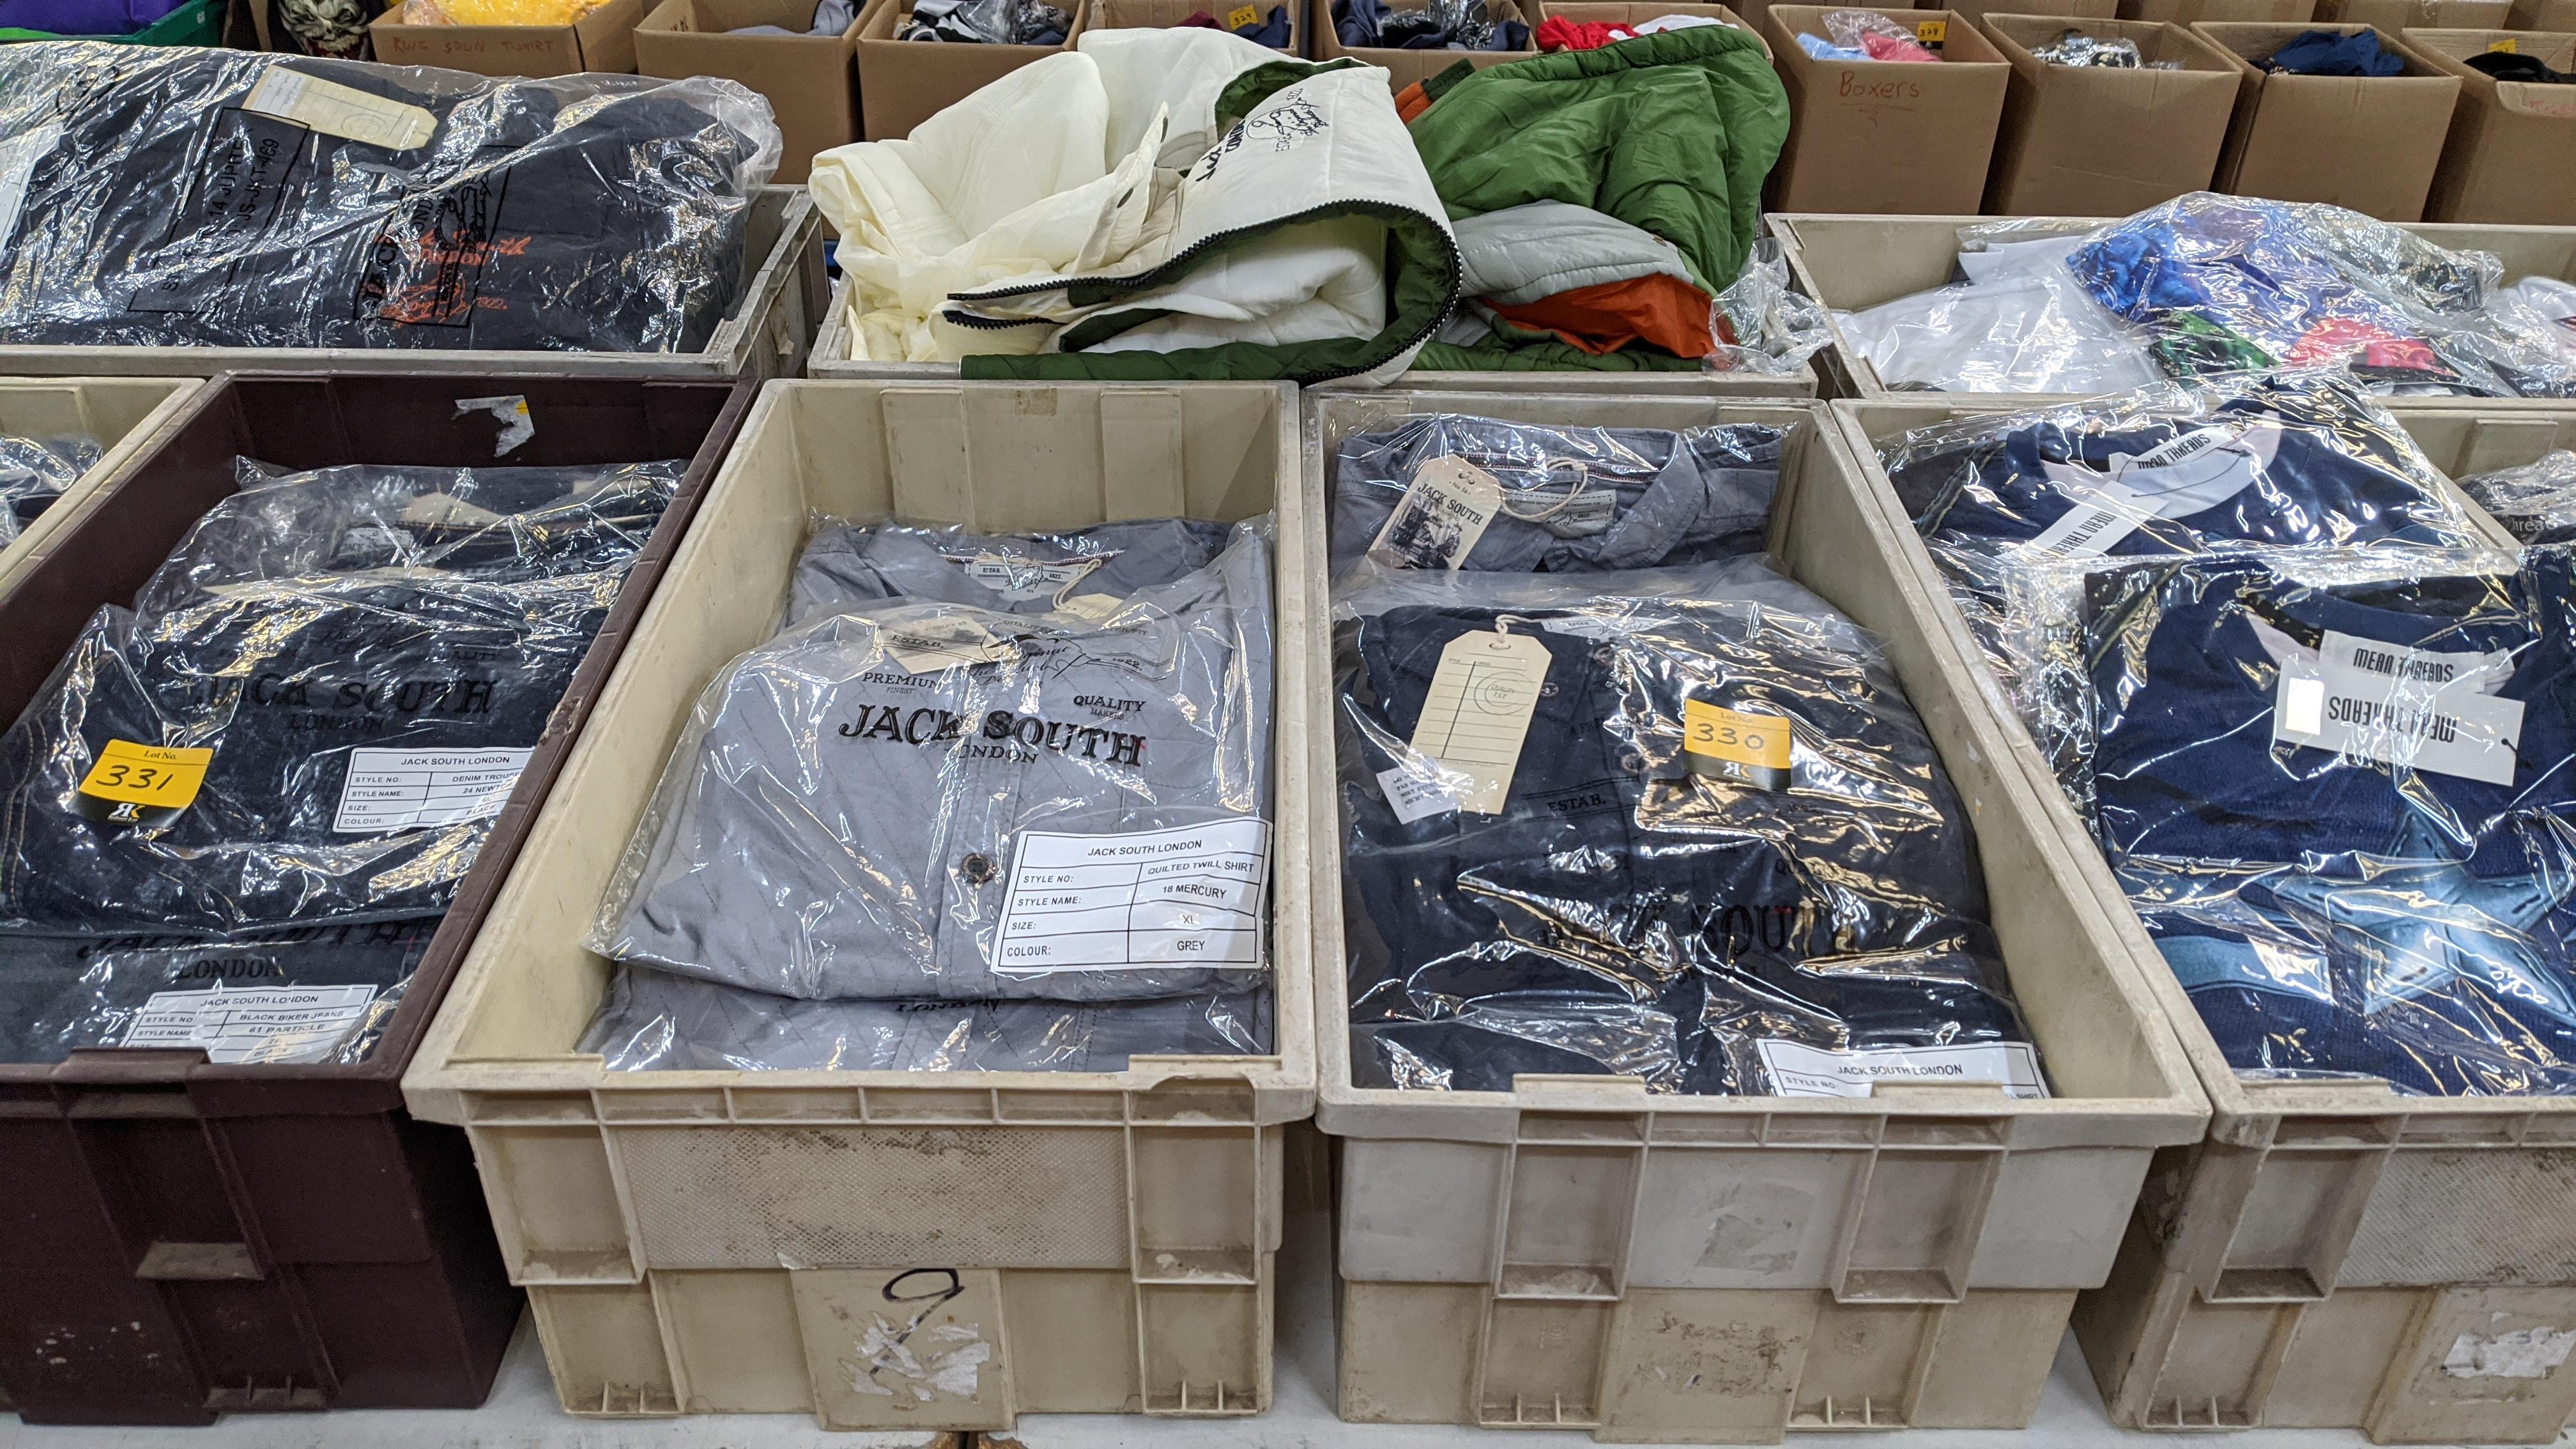 Very large quantity of primarily men's designer clothing & accessories. - Image 93 of 157